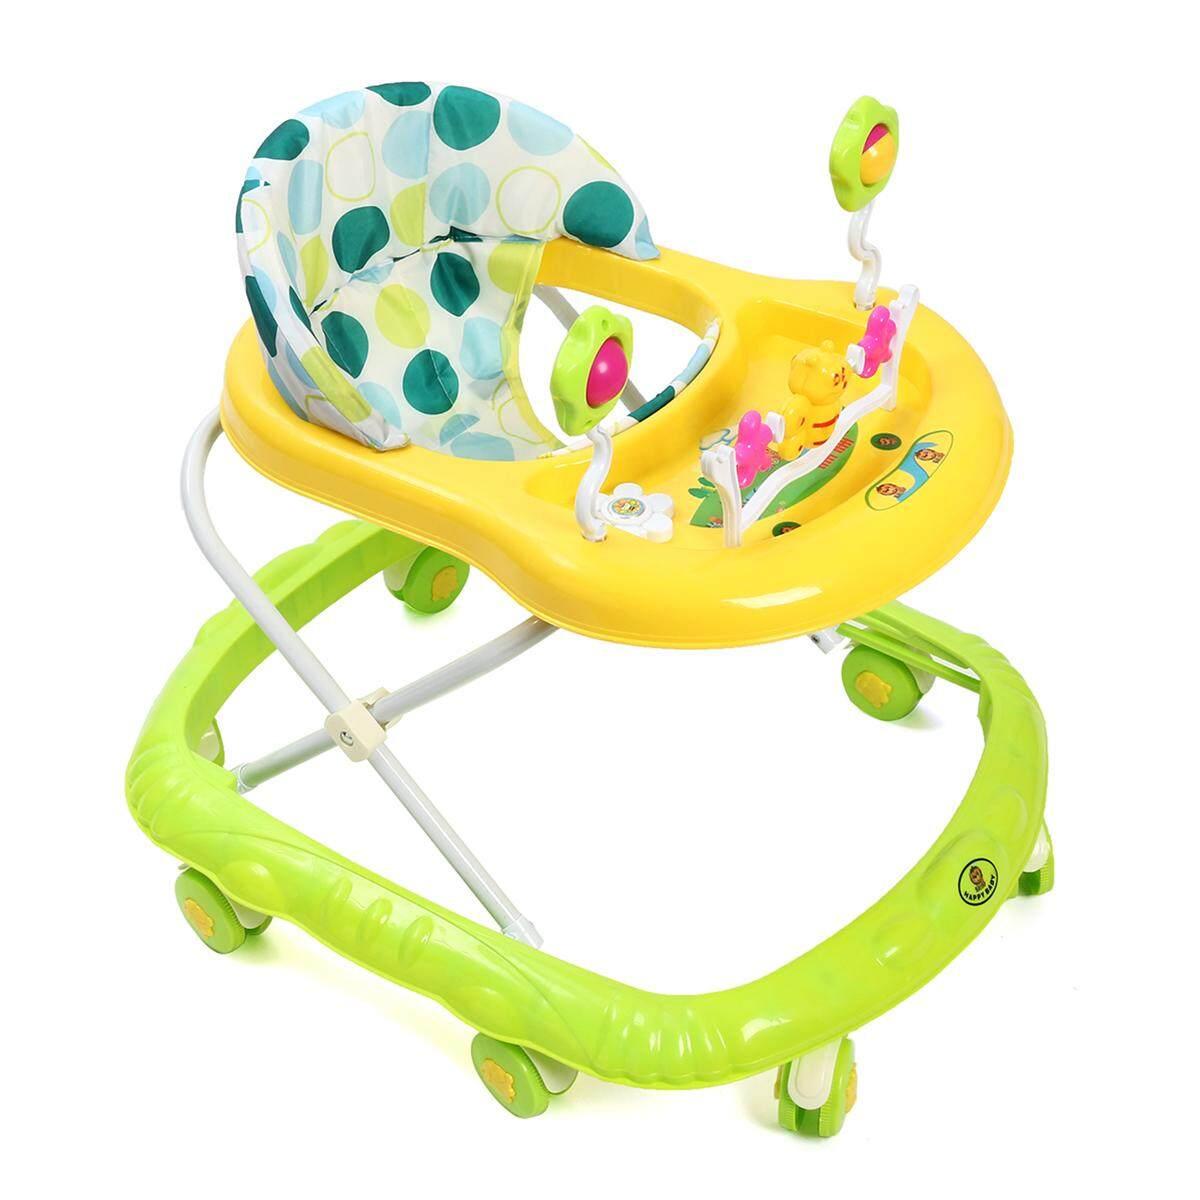 Wanderer Baby Walker Adjustable Activity Learn Toddler Mummy Toys Walk Jumper By Freebang.